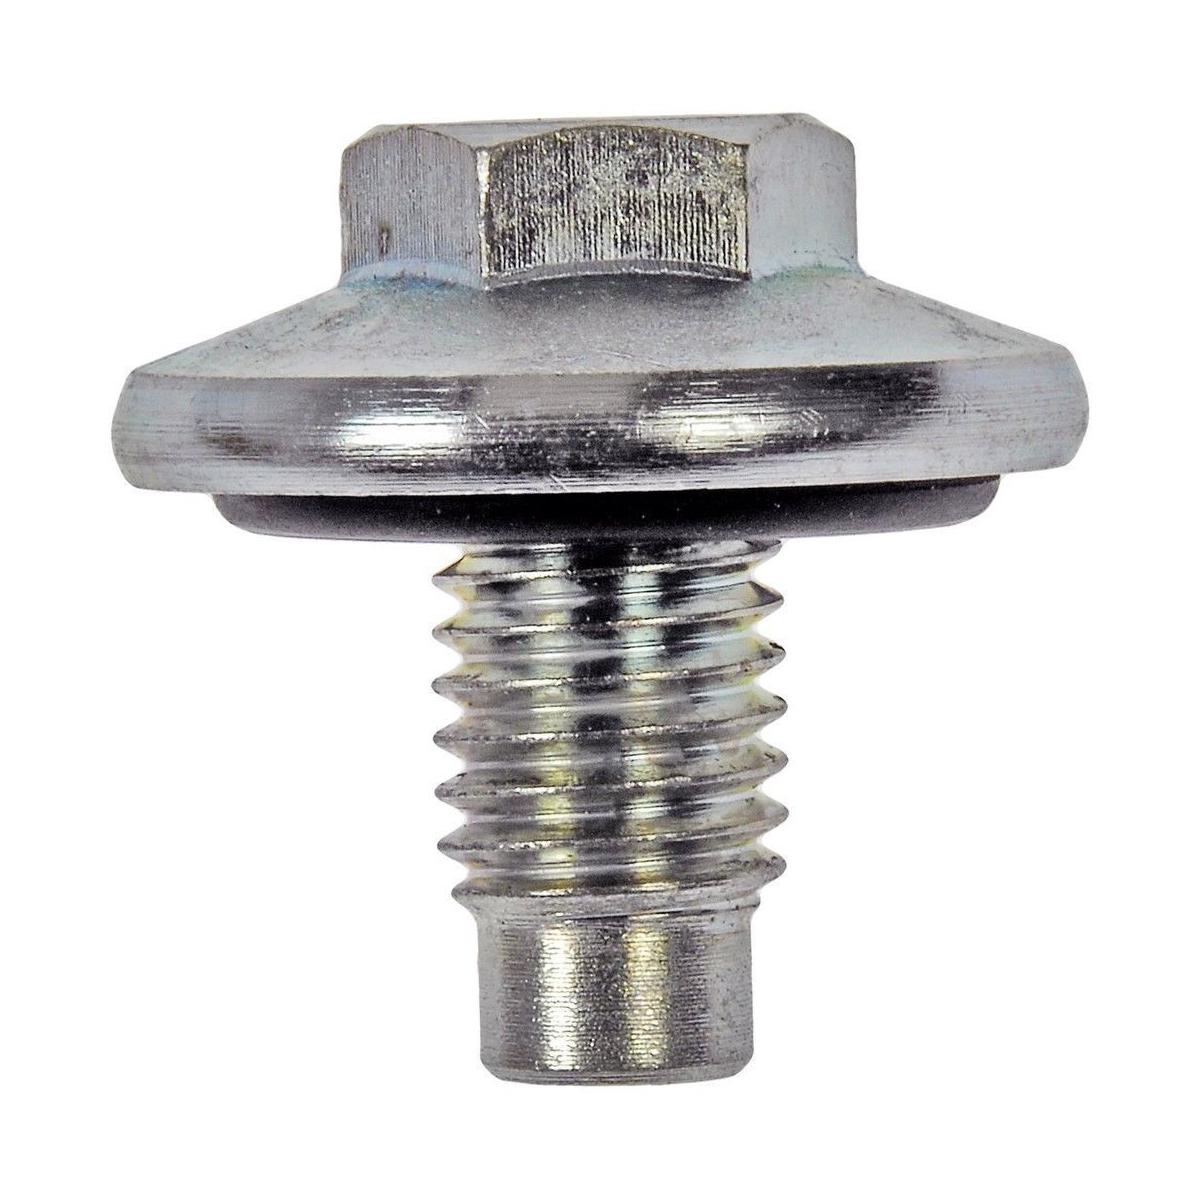 How To Drain Transmission Fluid >> Allison Automatic Transmission Fluid Pan Drain Plug For Gm 24233099